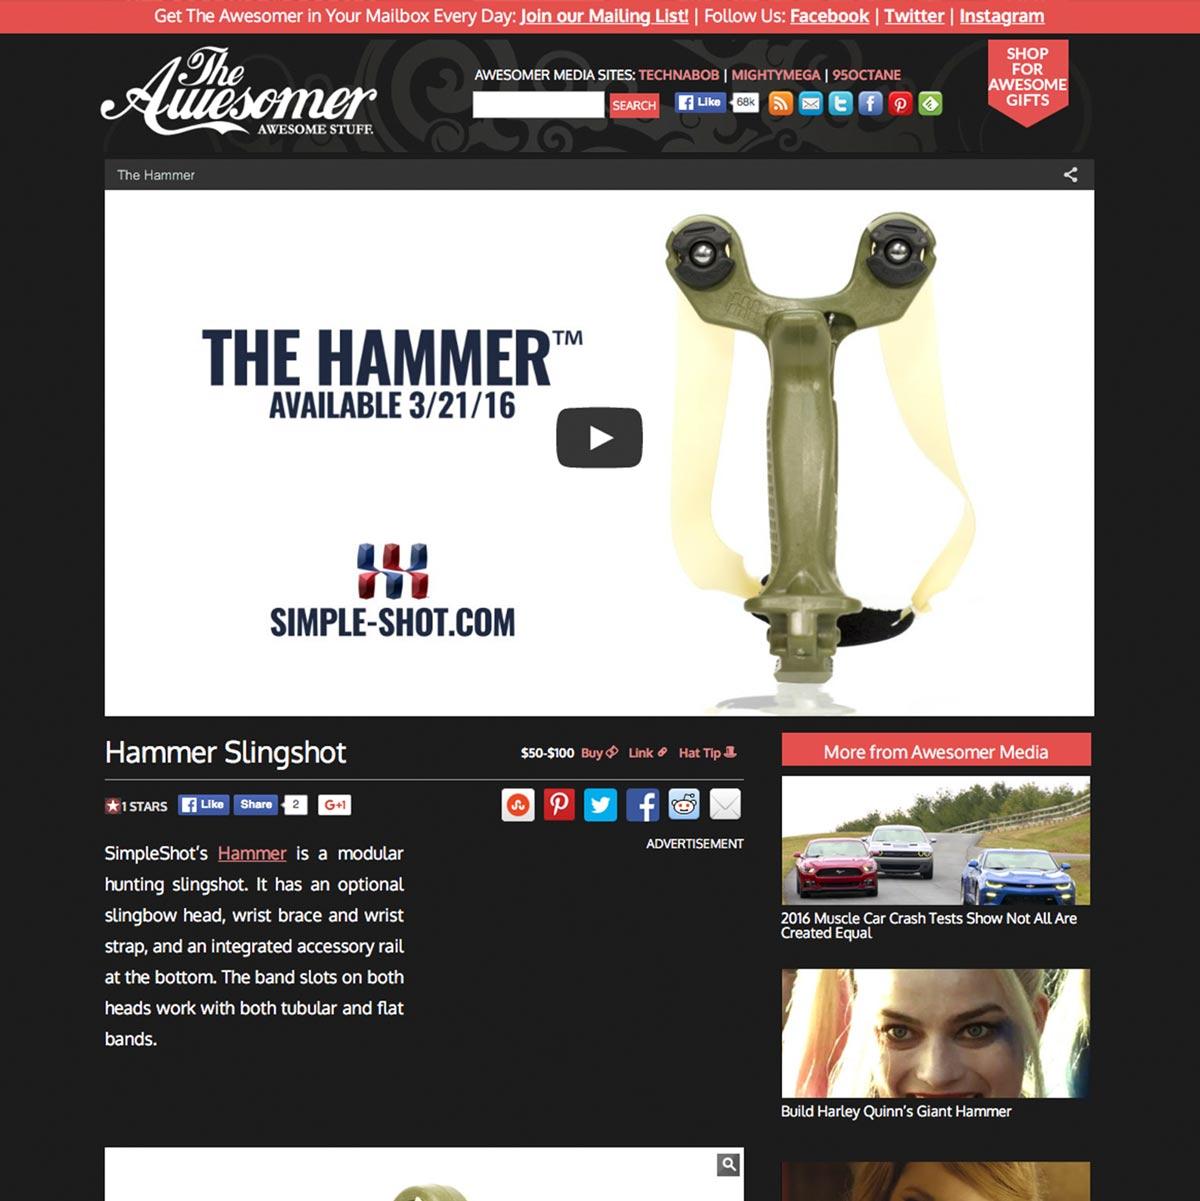 The Awesomer Hammer Slingshot Review